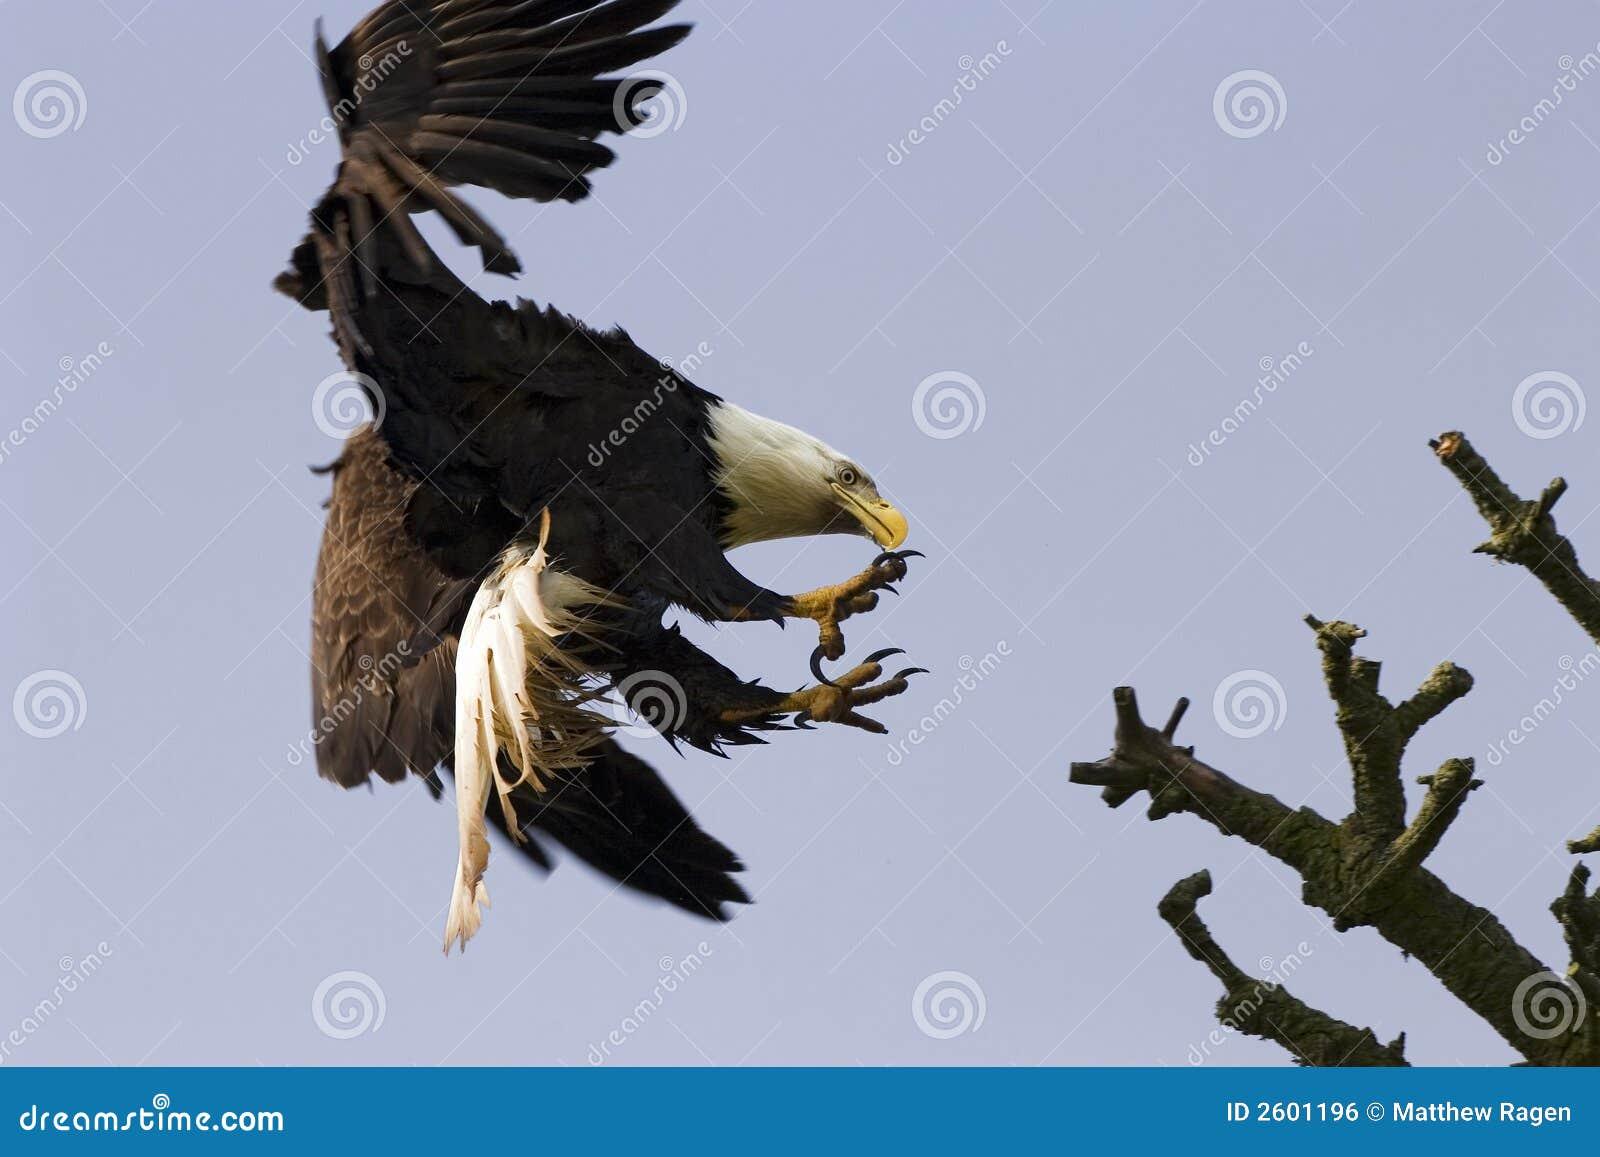 Bald Eagle With Talons